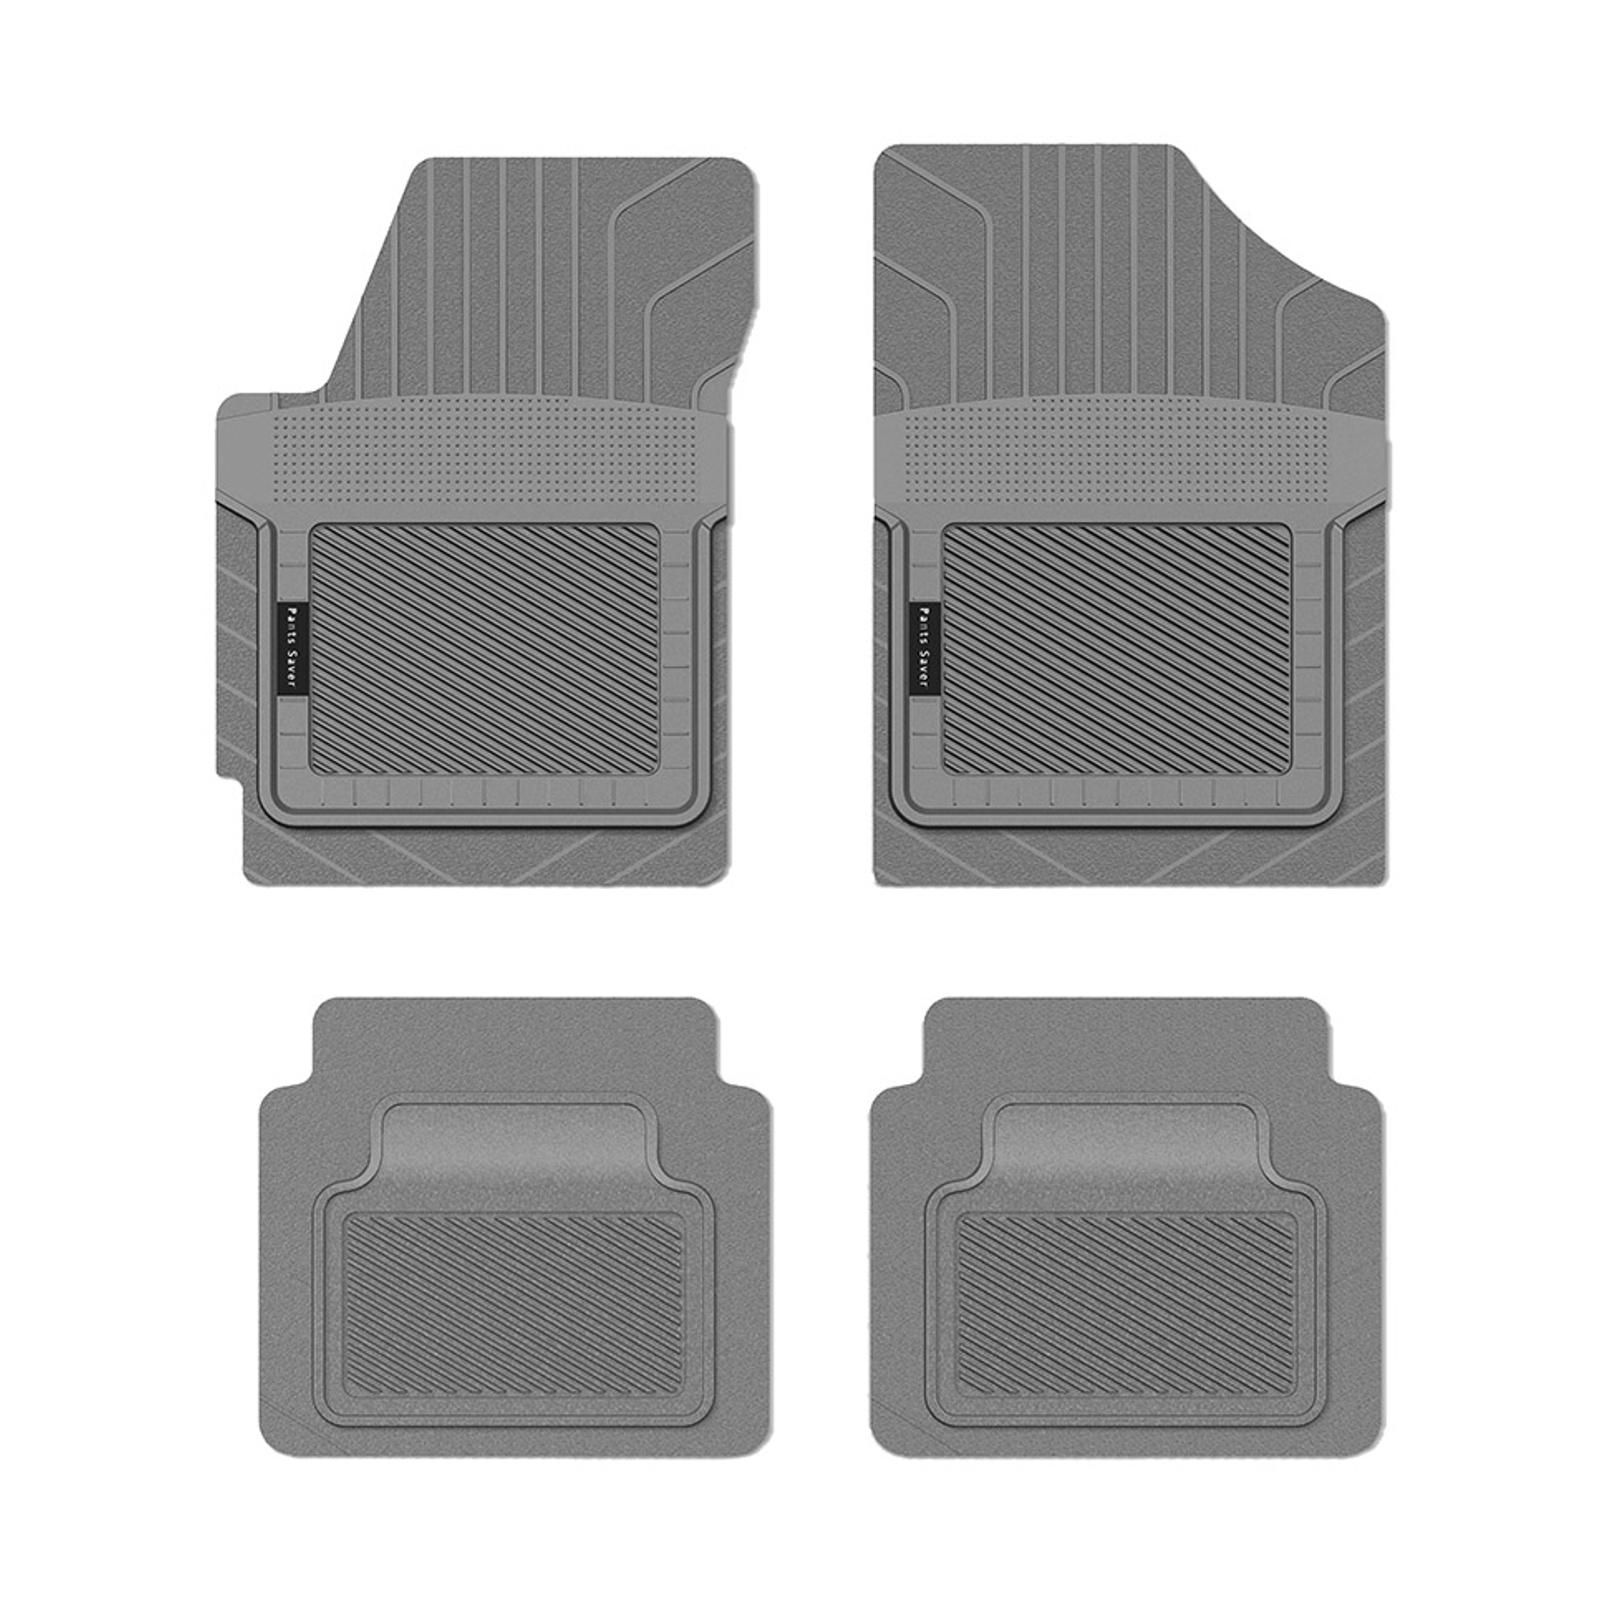 Koolatron Pants Saver Custom Fit Car Mat 4PC Ford Taurus 2008 Tan PartNumber: 02842785000P KsnValue: 082V009244040000 MfgPartNumber: 1026083